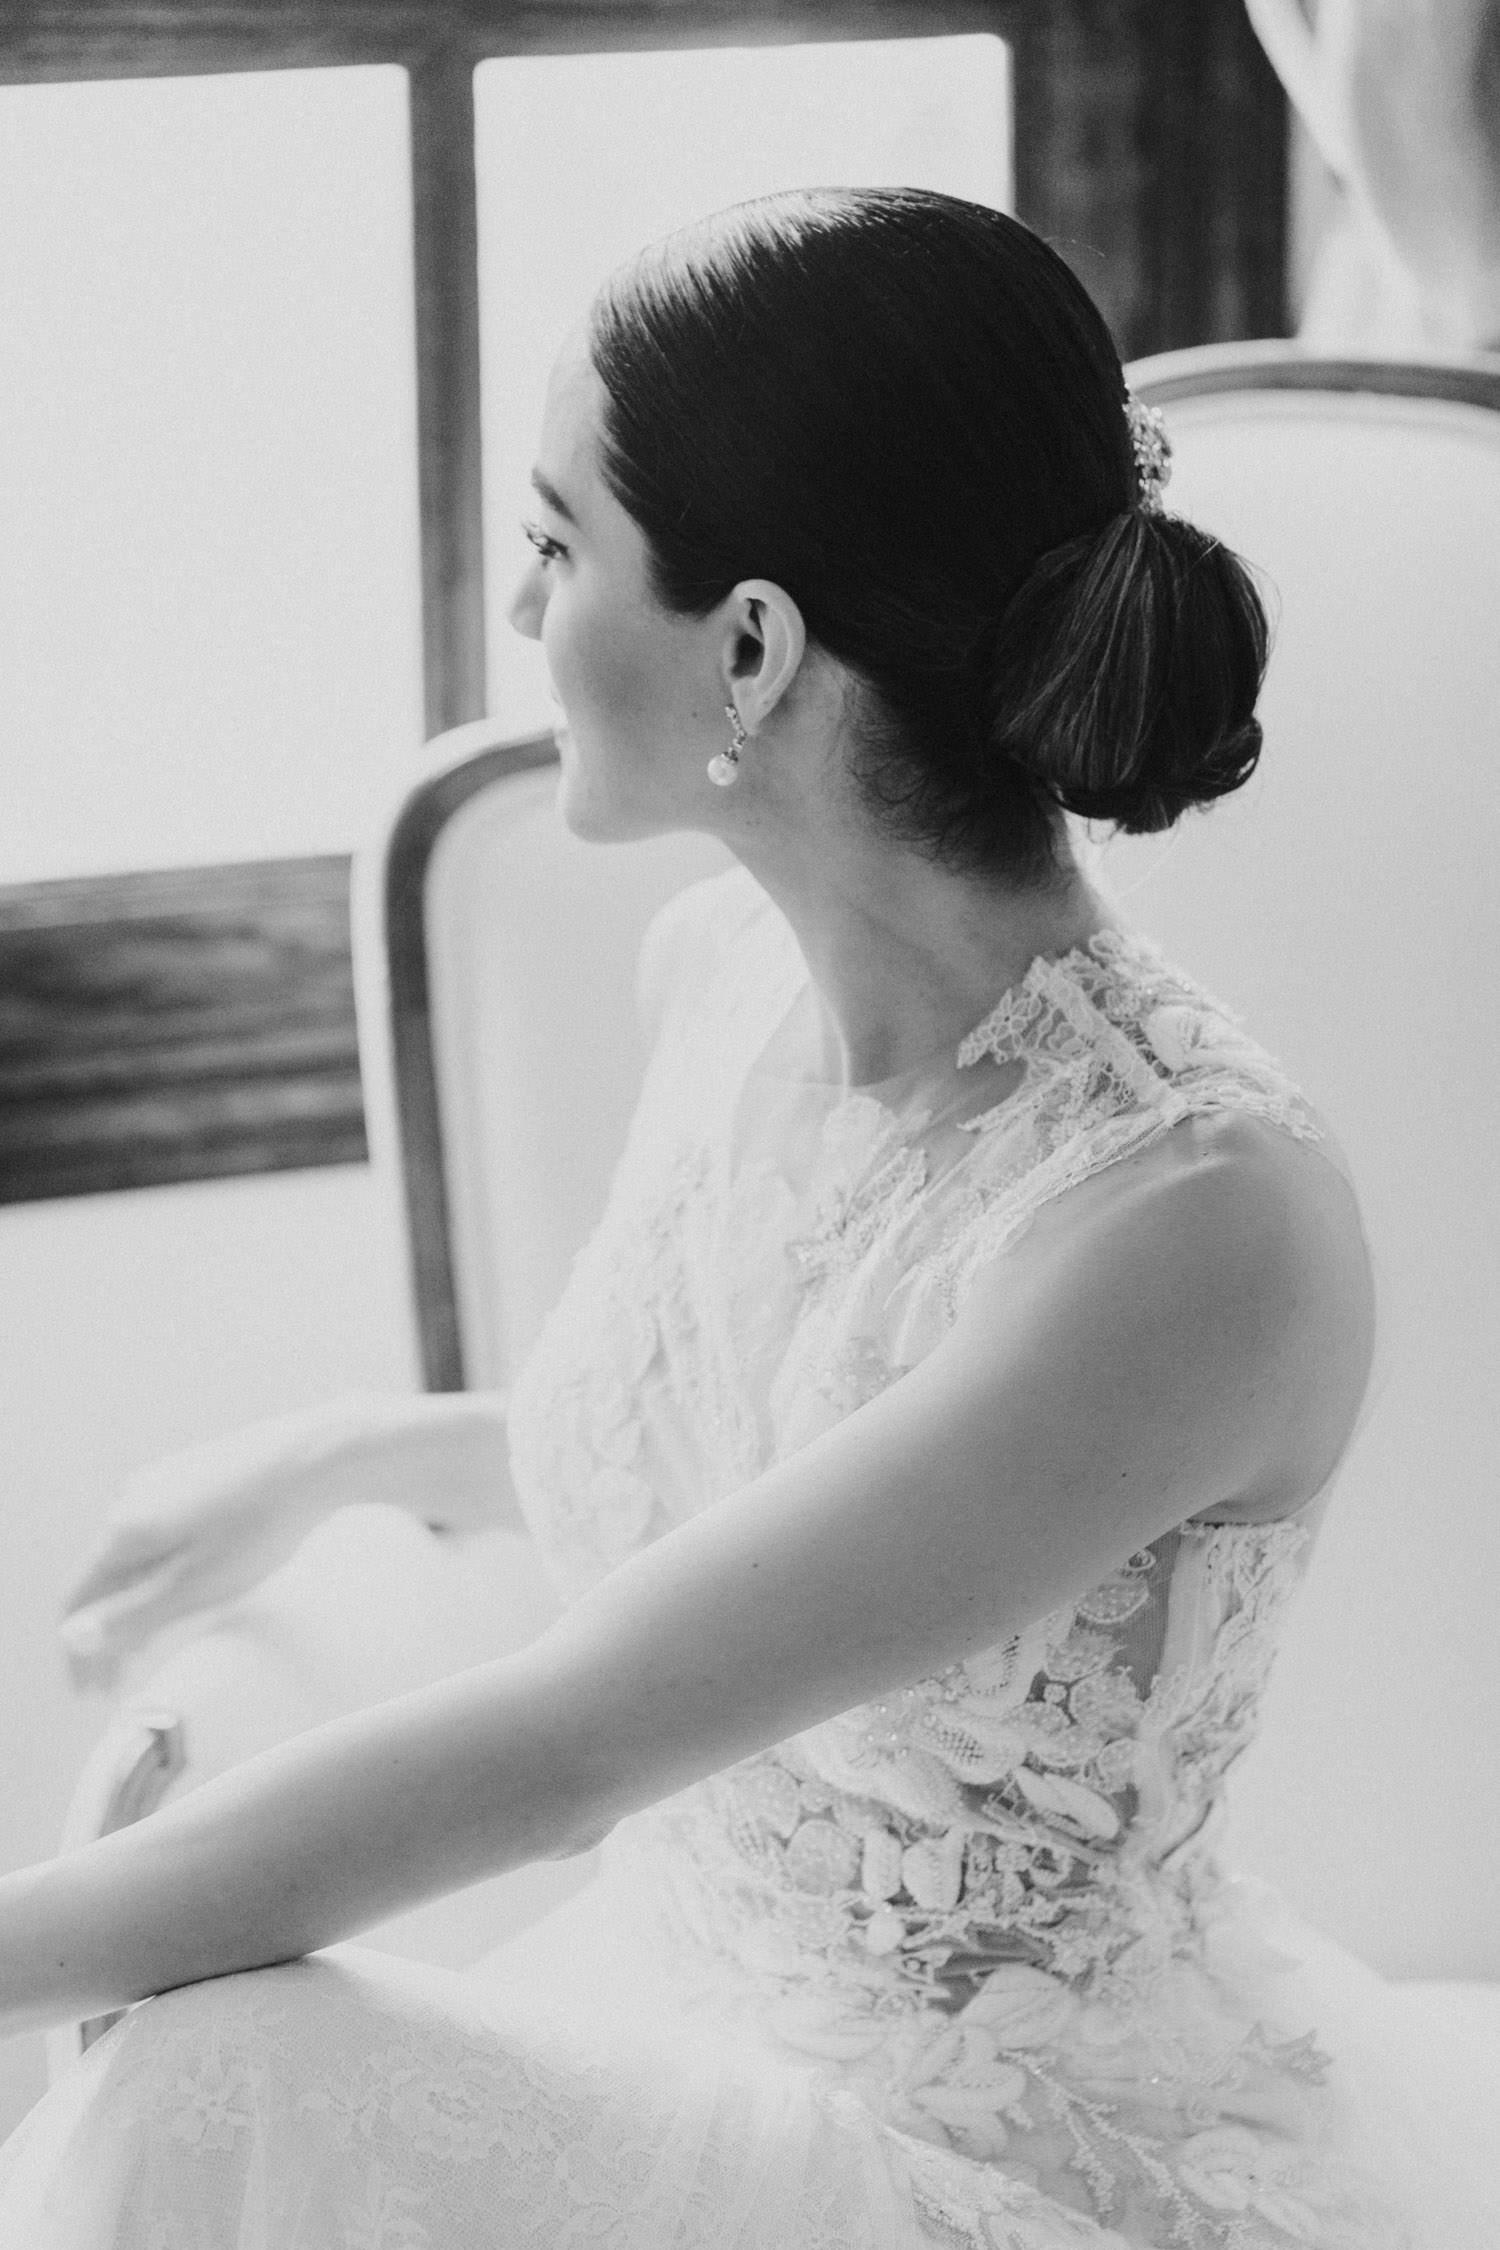 San-Miguel-de-Allende-Wedding-Photography-Parroquia-Instituto-Boda-Fotografia-Fer-Sergio-Pierce-Lifestyle-Photography0099.JPG